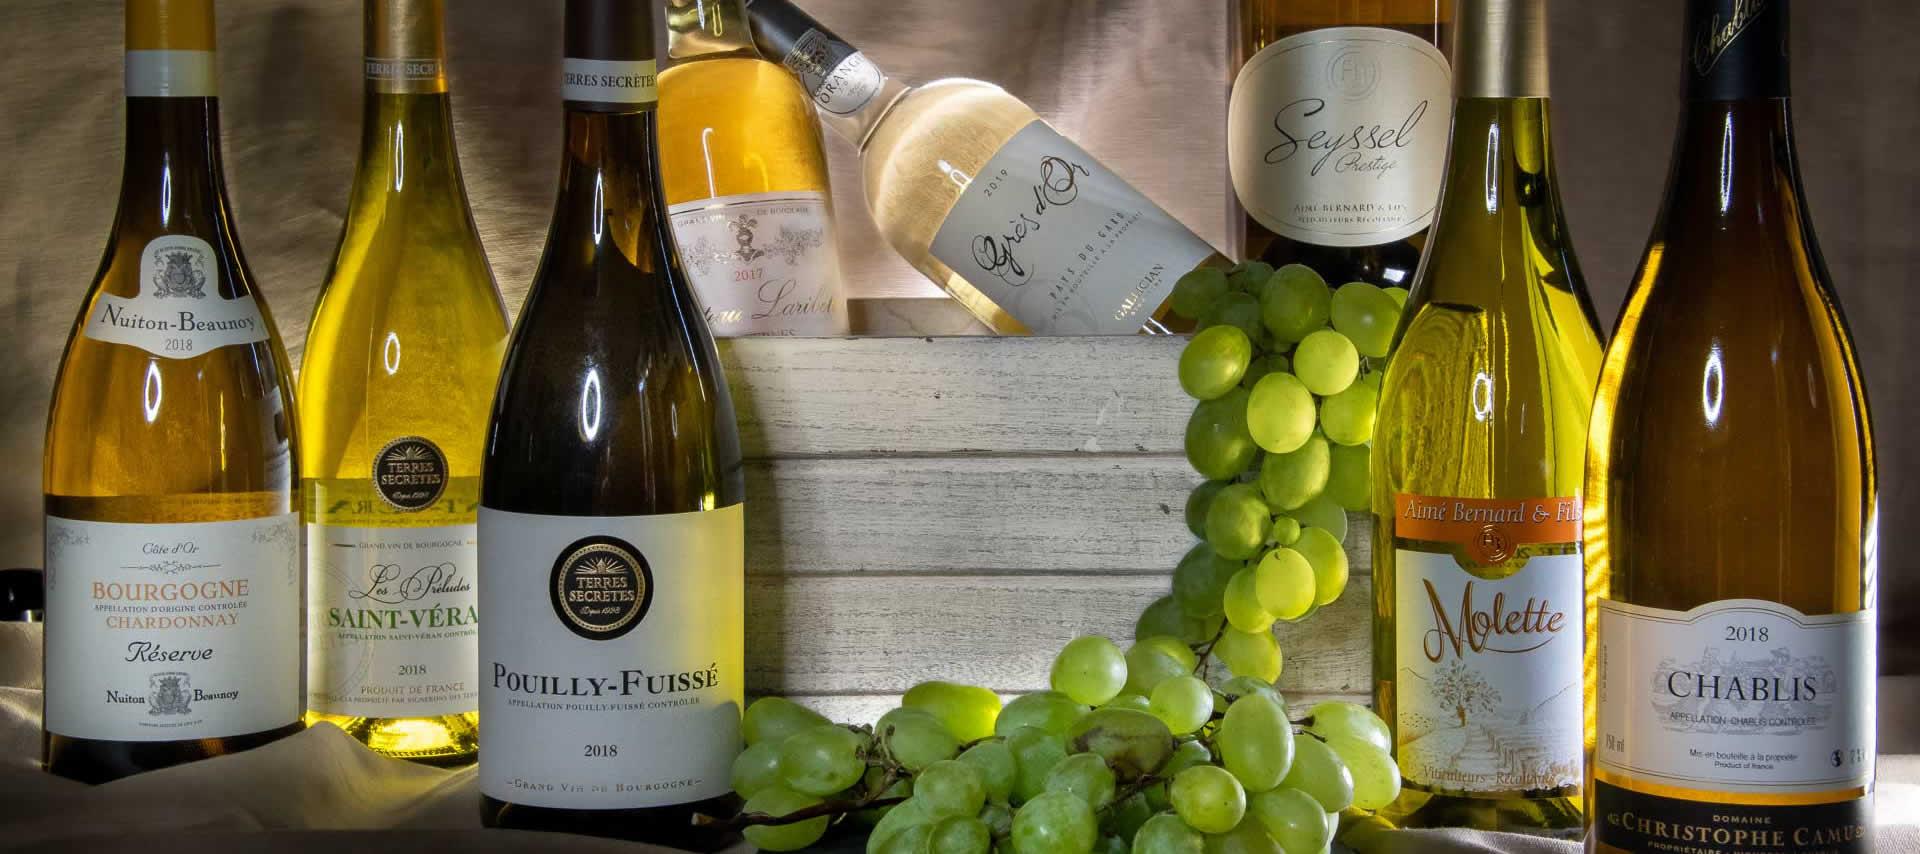 Rossi, Bianchi, Rosati: i grandi vini francesi...